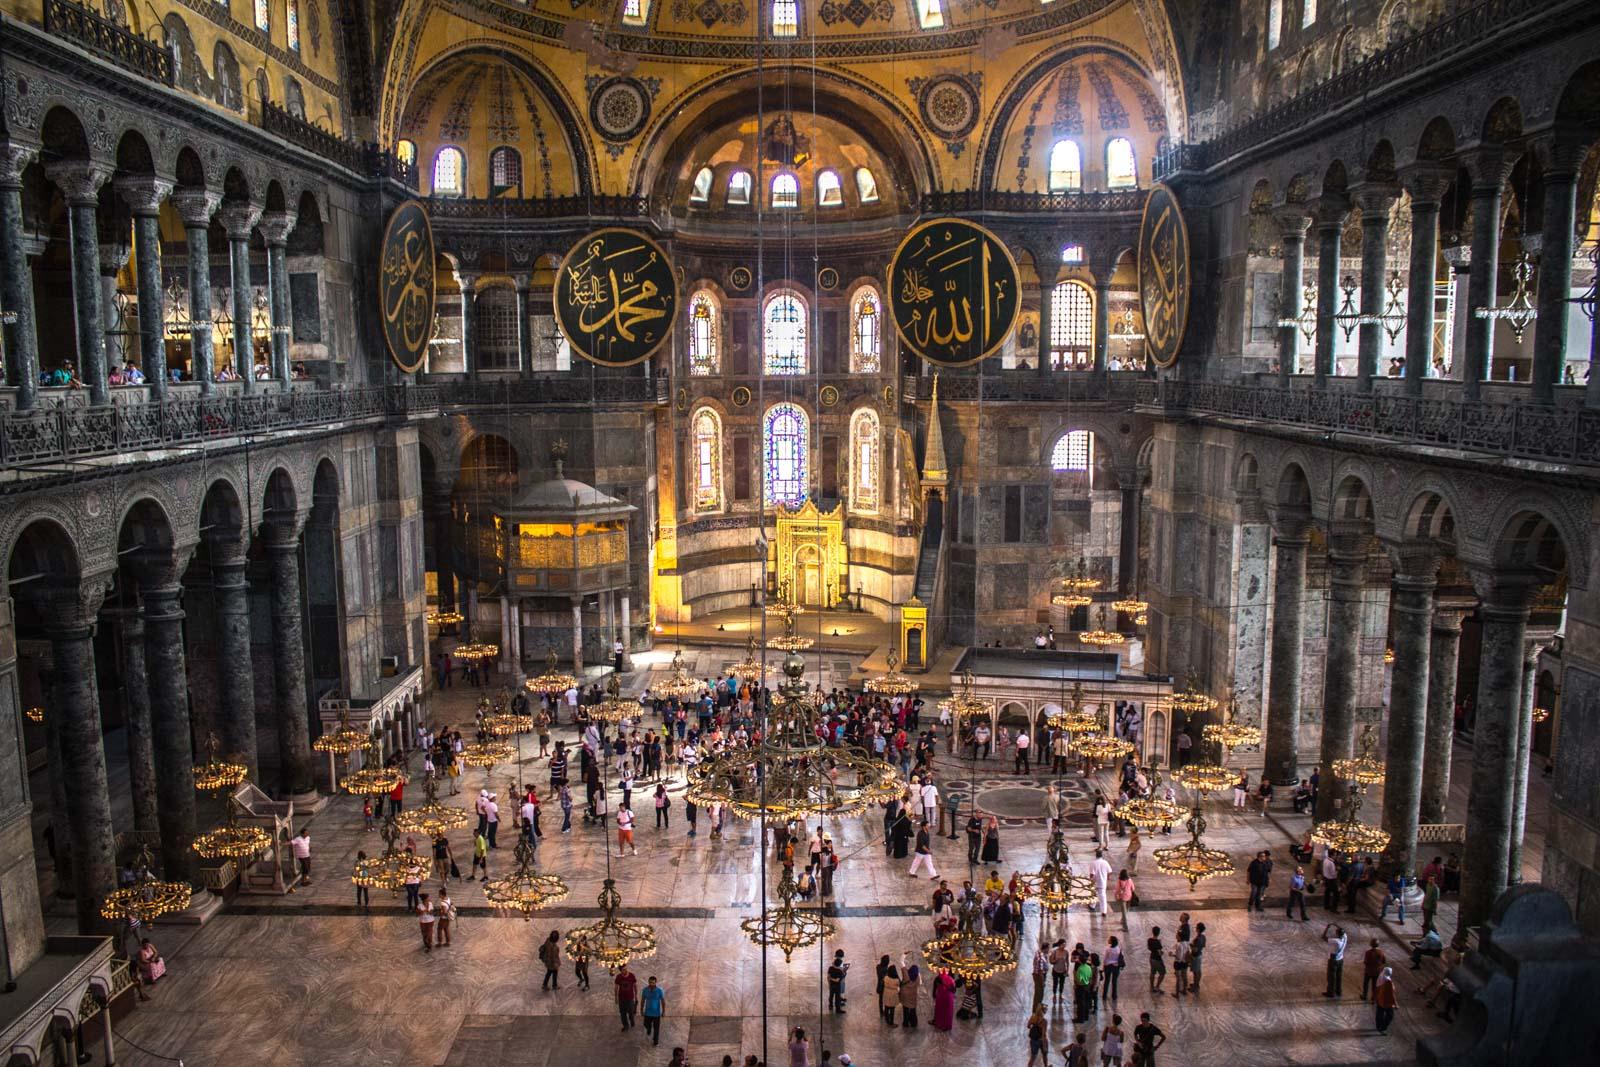 Hagia Sophia - Trái tim của Thổ Nhĩ Kỳ